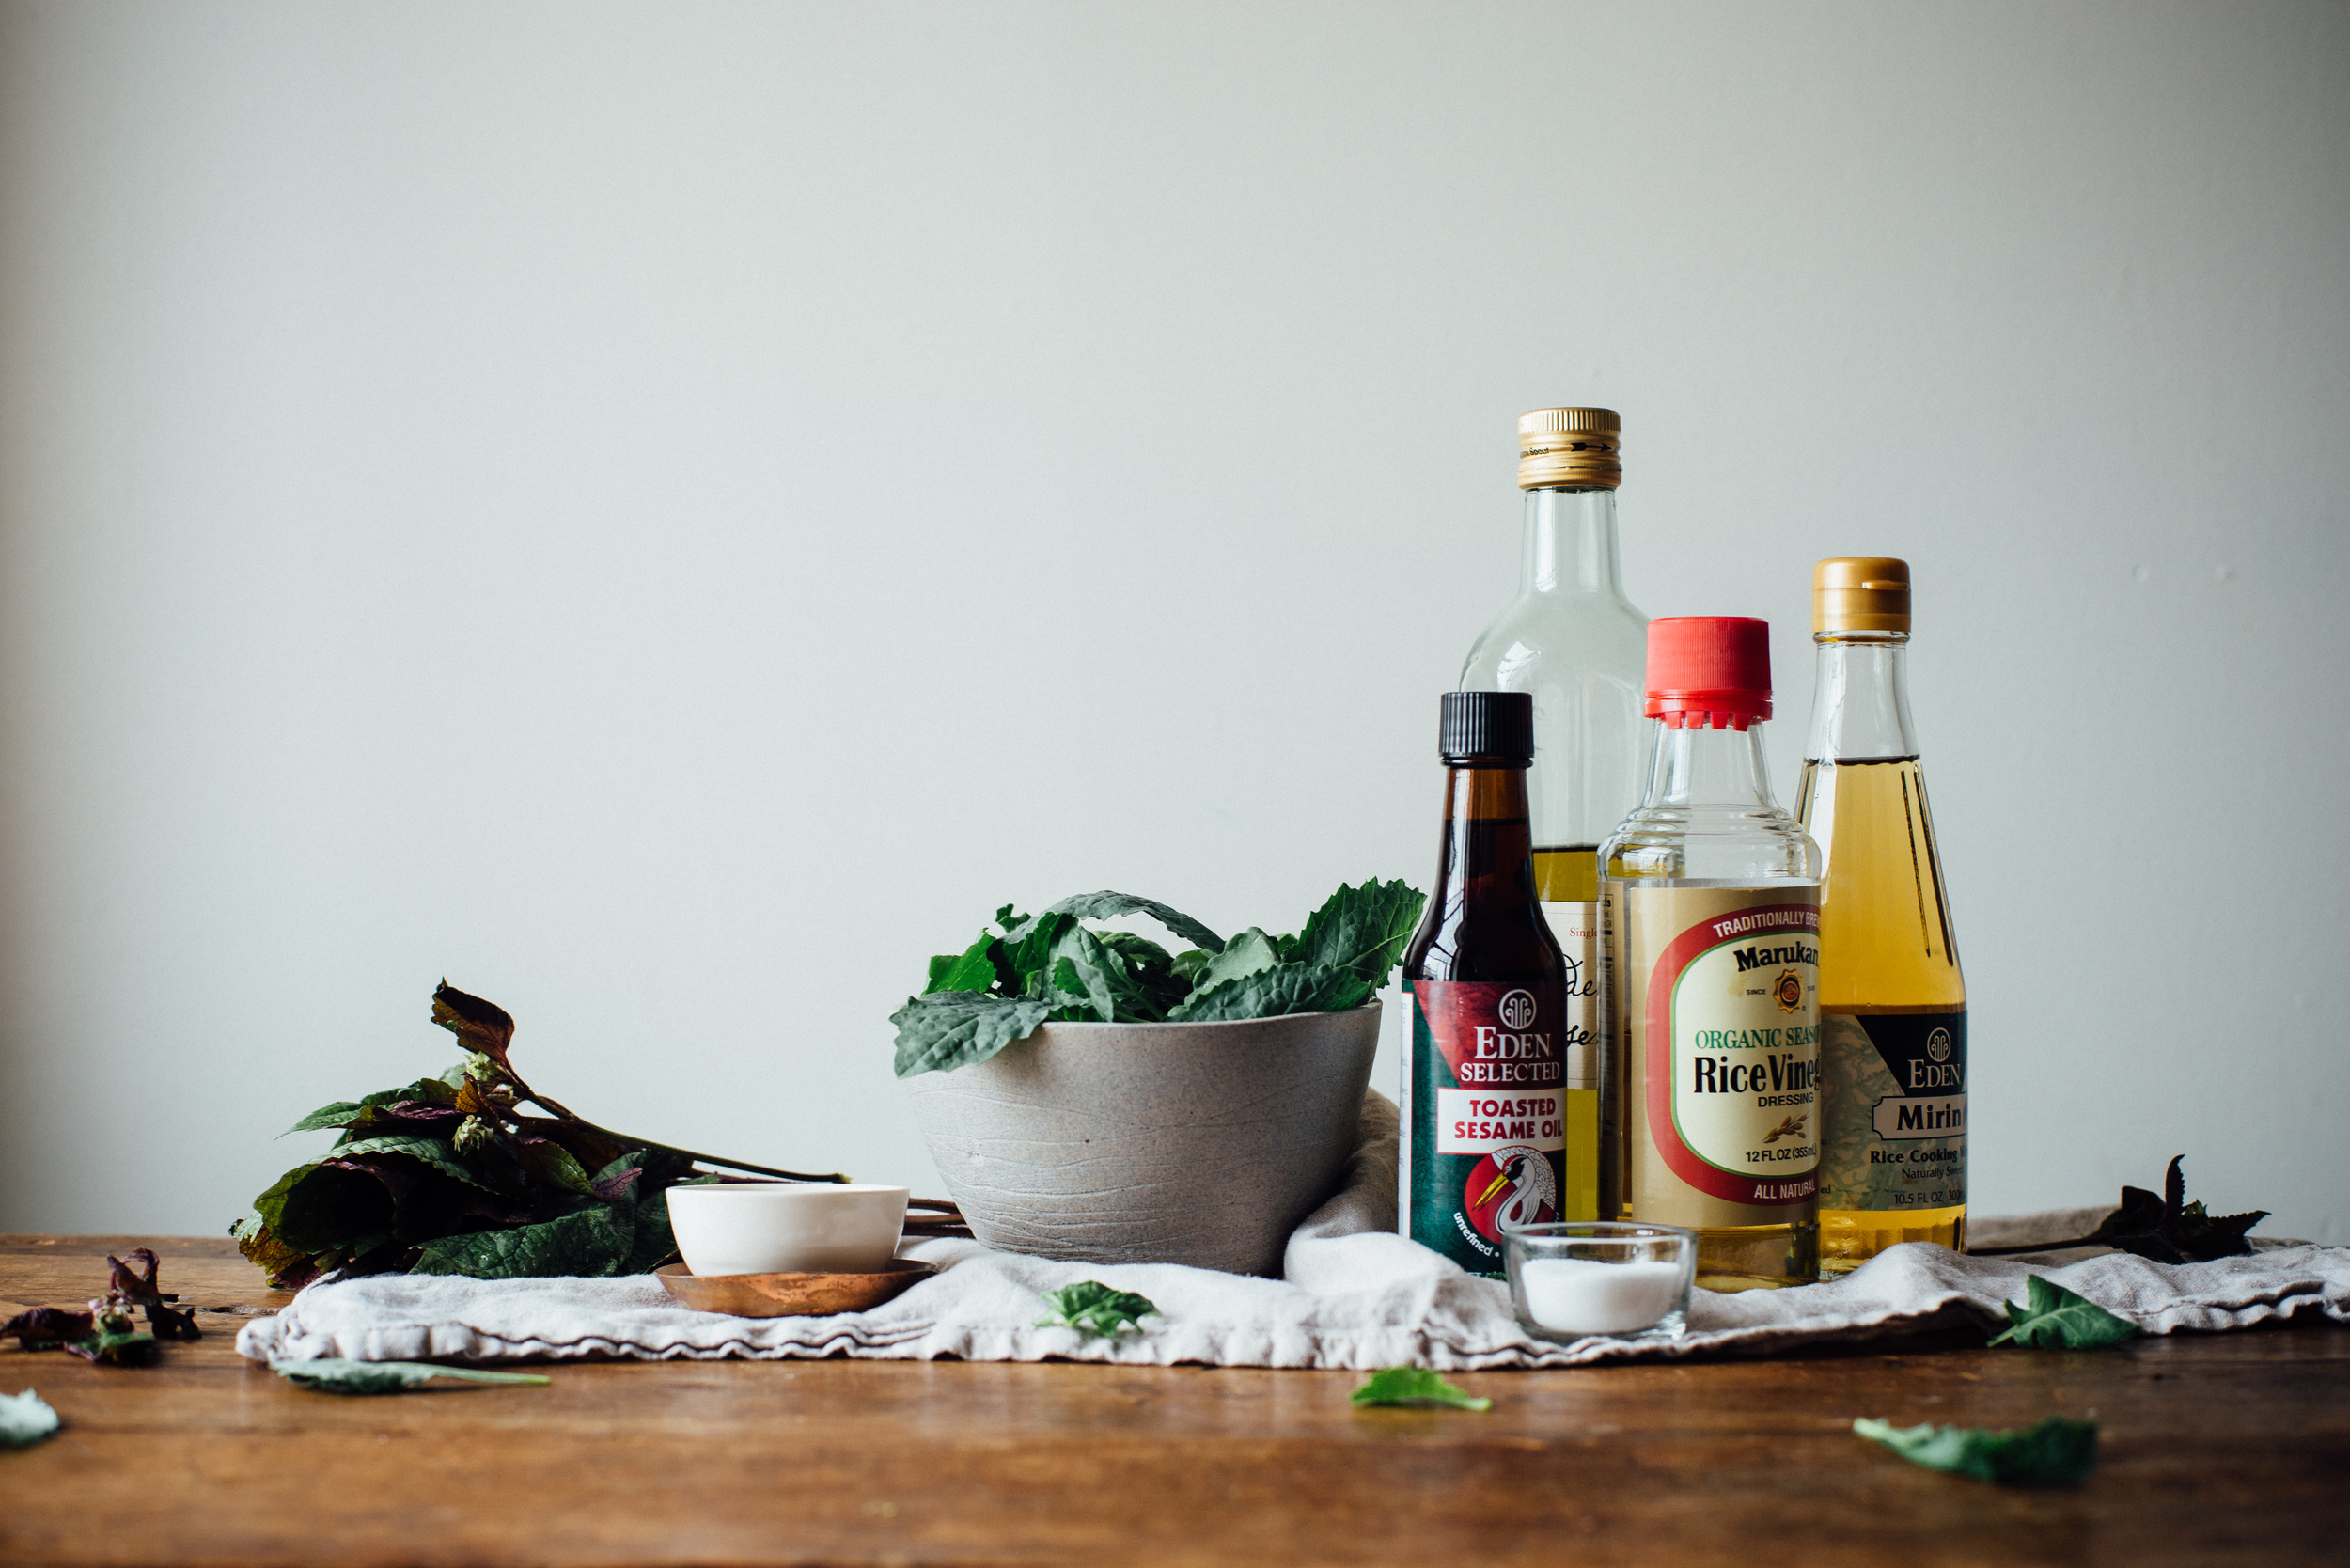 warm sautéed grapes, autumn kale + edamame salad w/ shiso vinaigrette